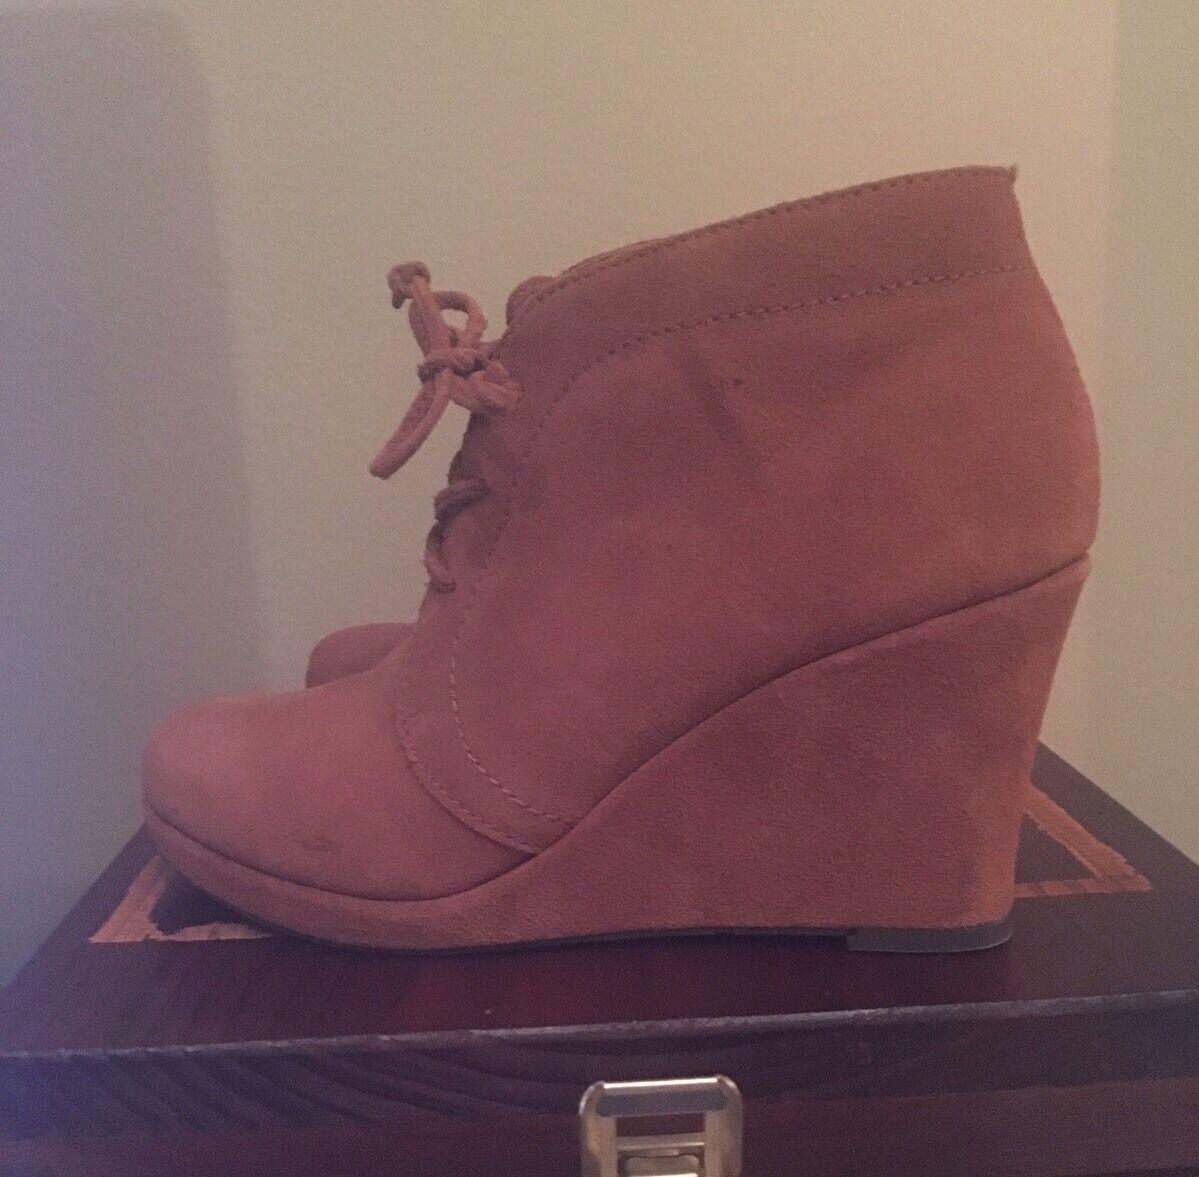 NWOT DV by Dolce Vita Braun Suede Leder Wedge Lace Up Ankle Boot Größe 7